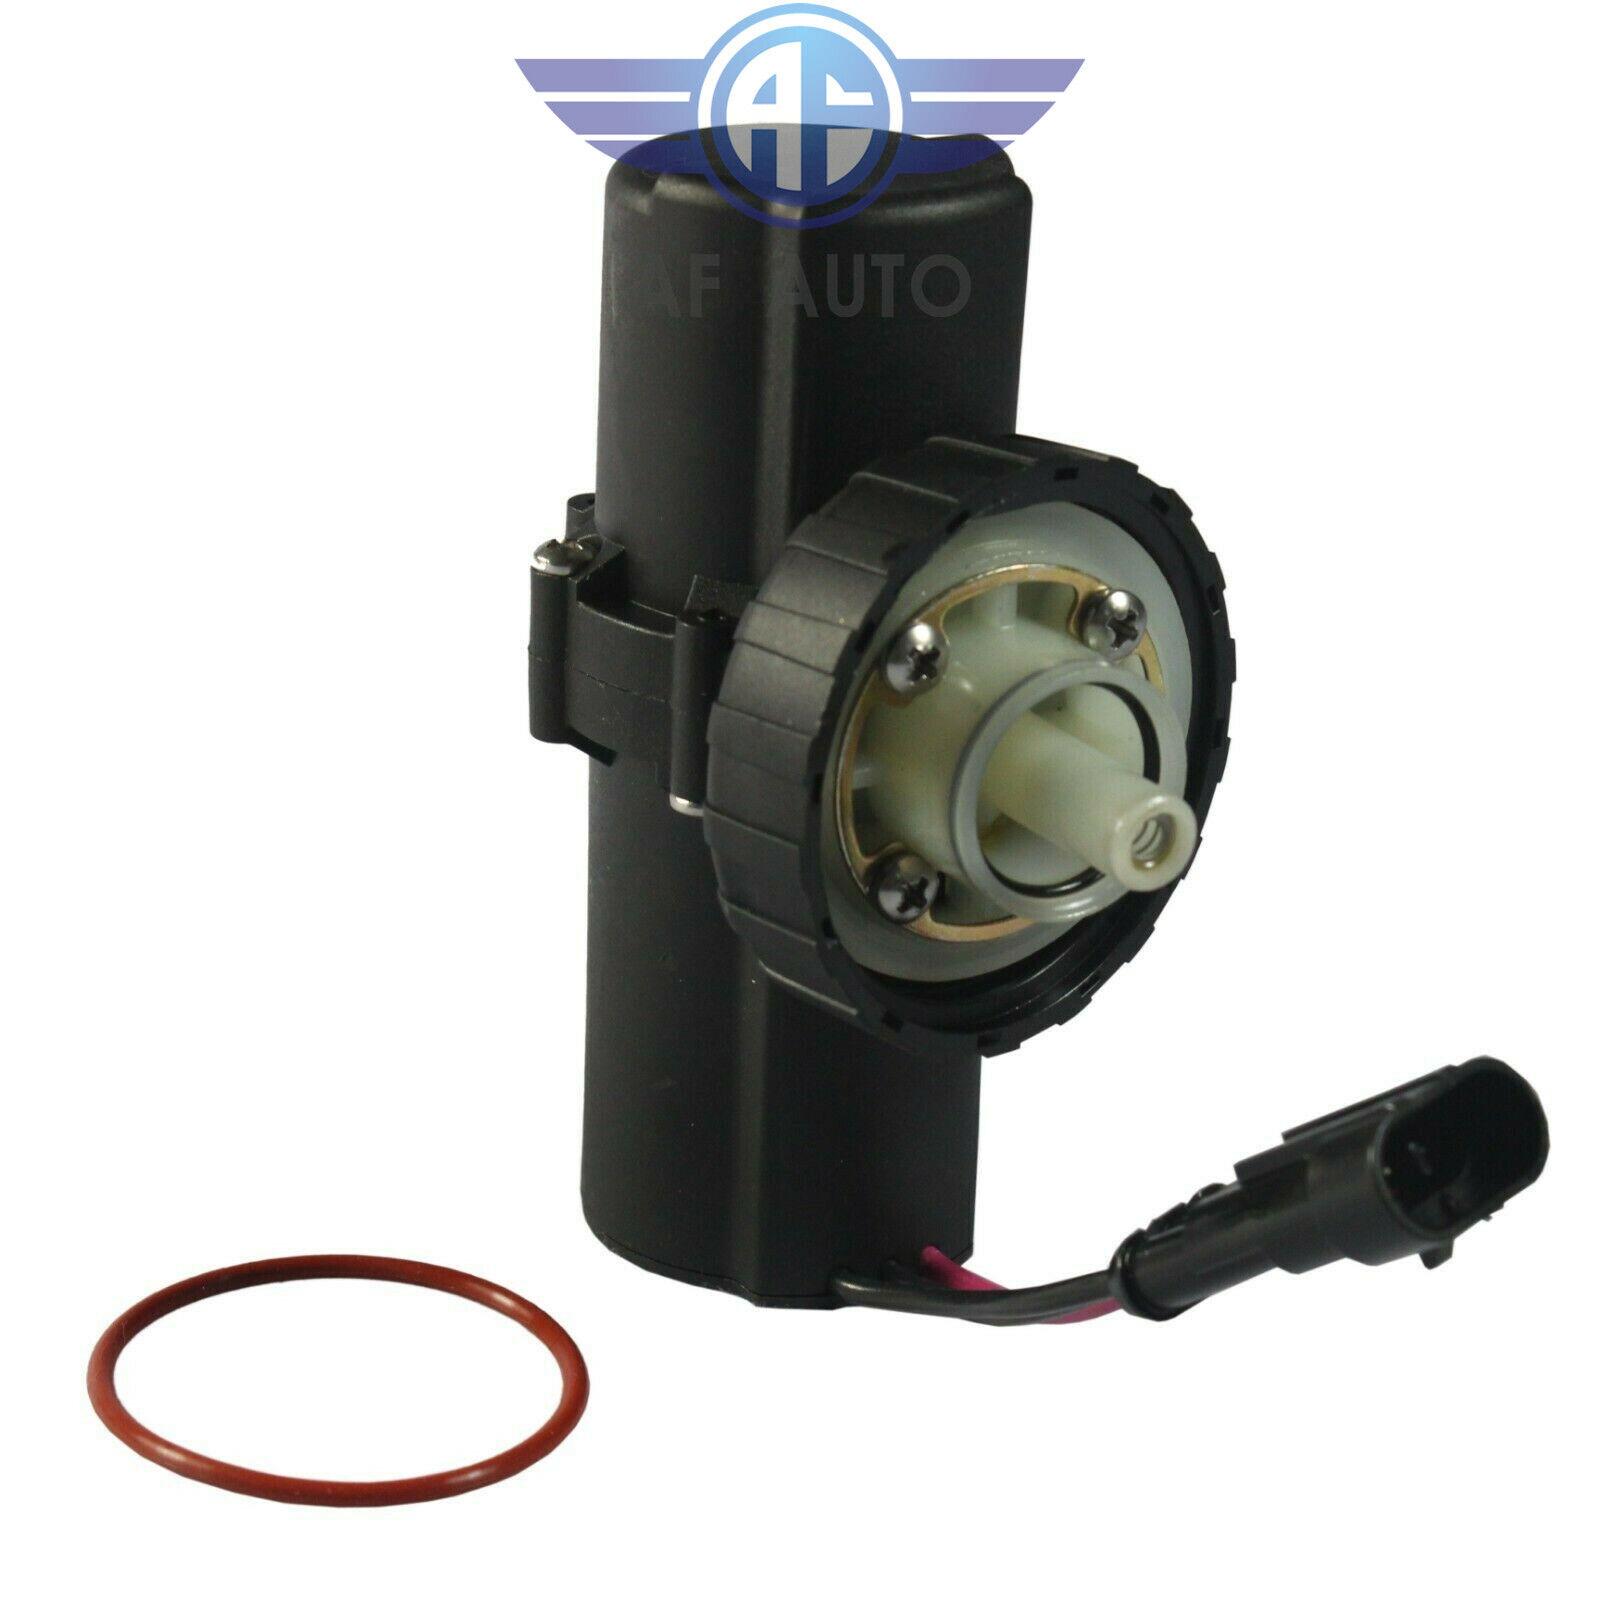 Fuel Pump for Case IH FIAT M TM TS 90 100 New Holland Backhoe 555E 87802238